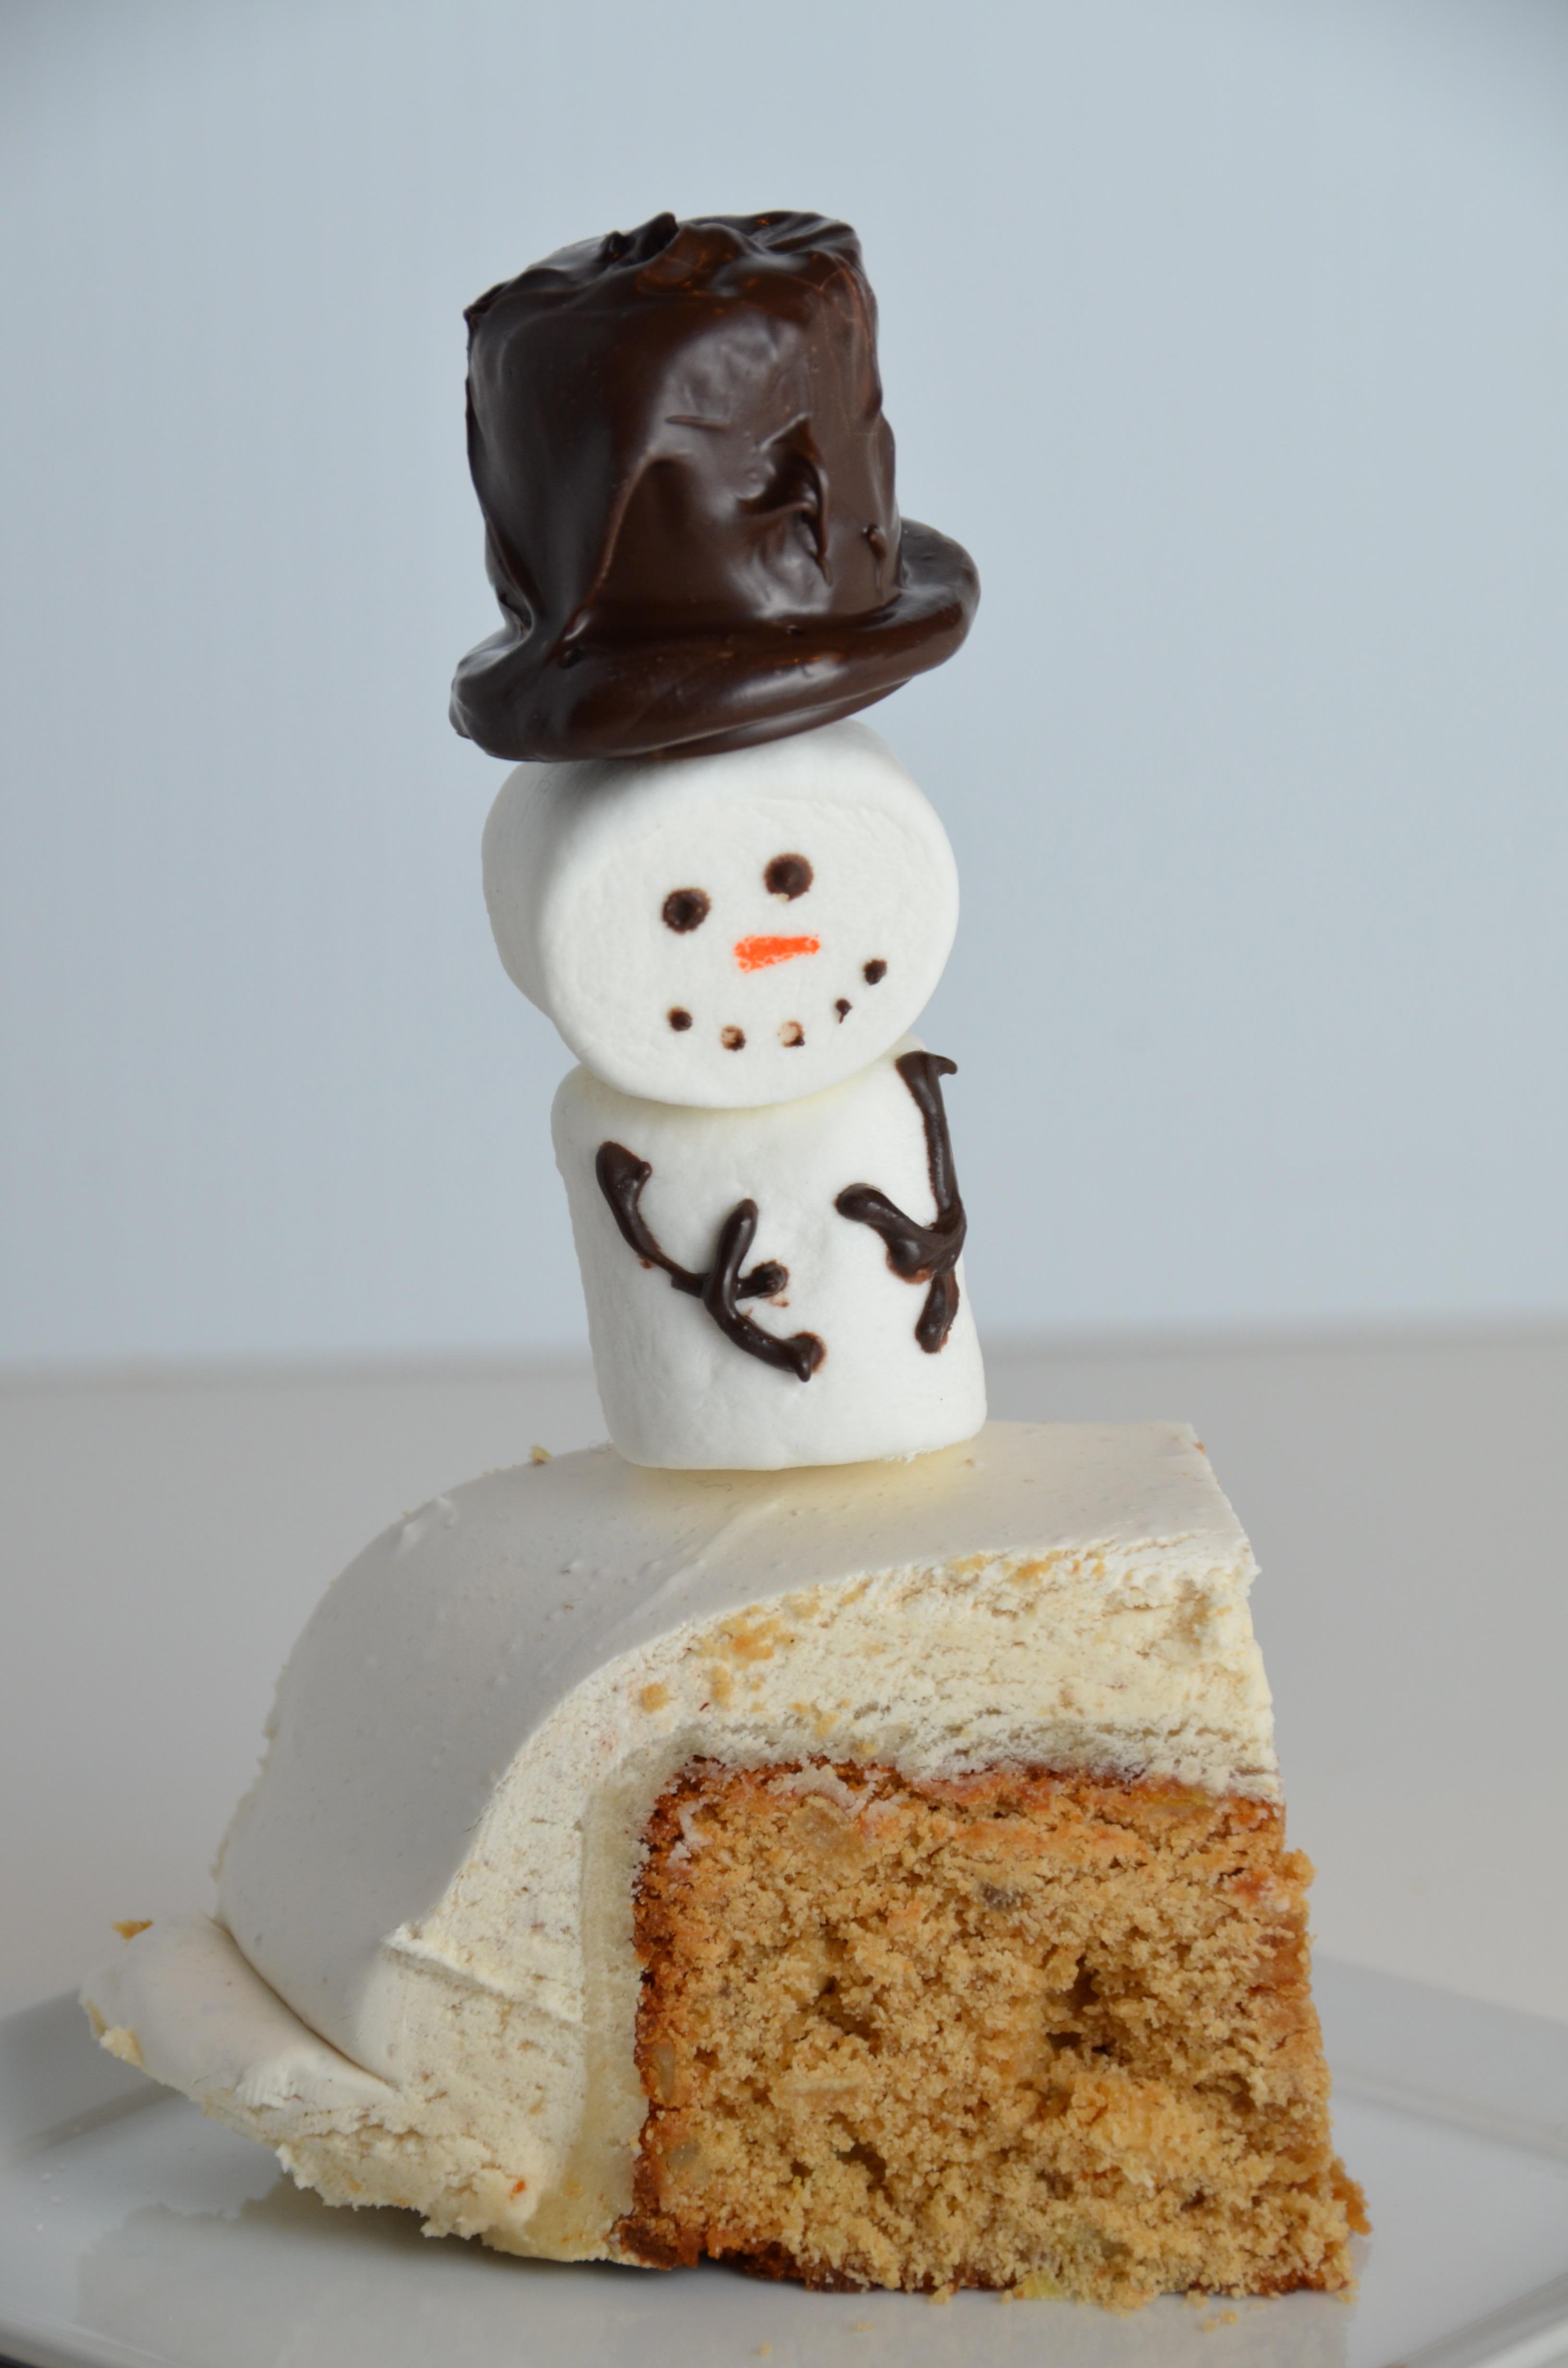 Ginger Wine Fruitcake With Caramel Royal Icing And